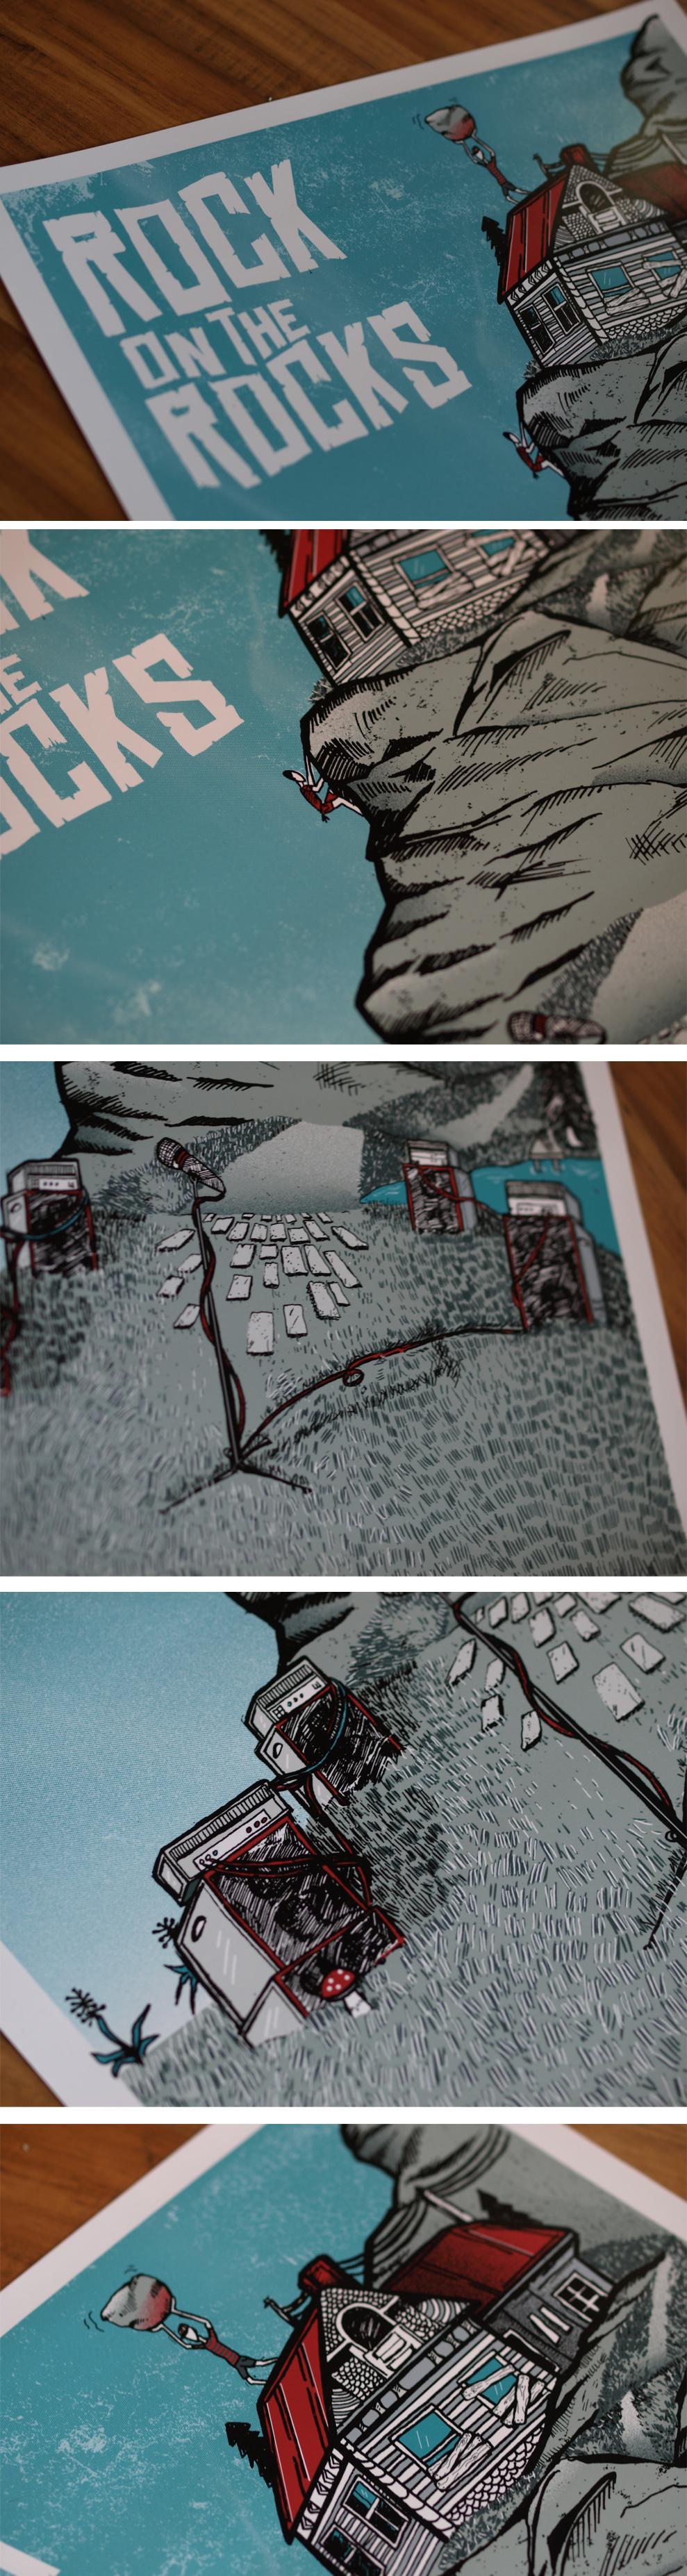 3/23 Silk scrren print: Rock on the Rocks Festival - image 2 - student project